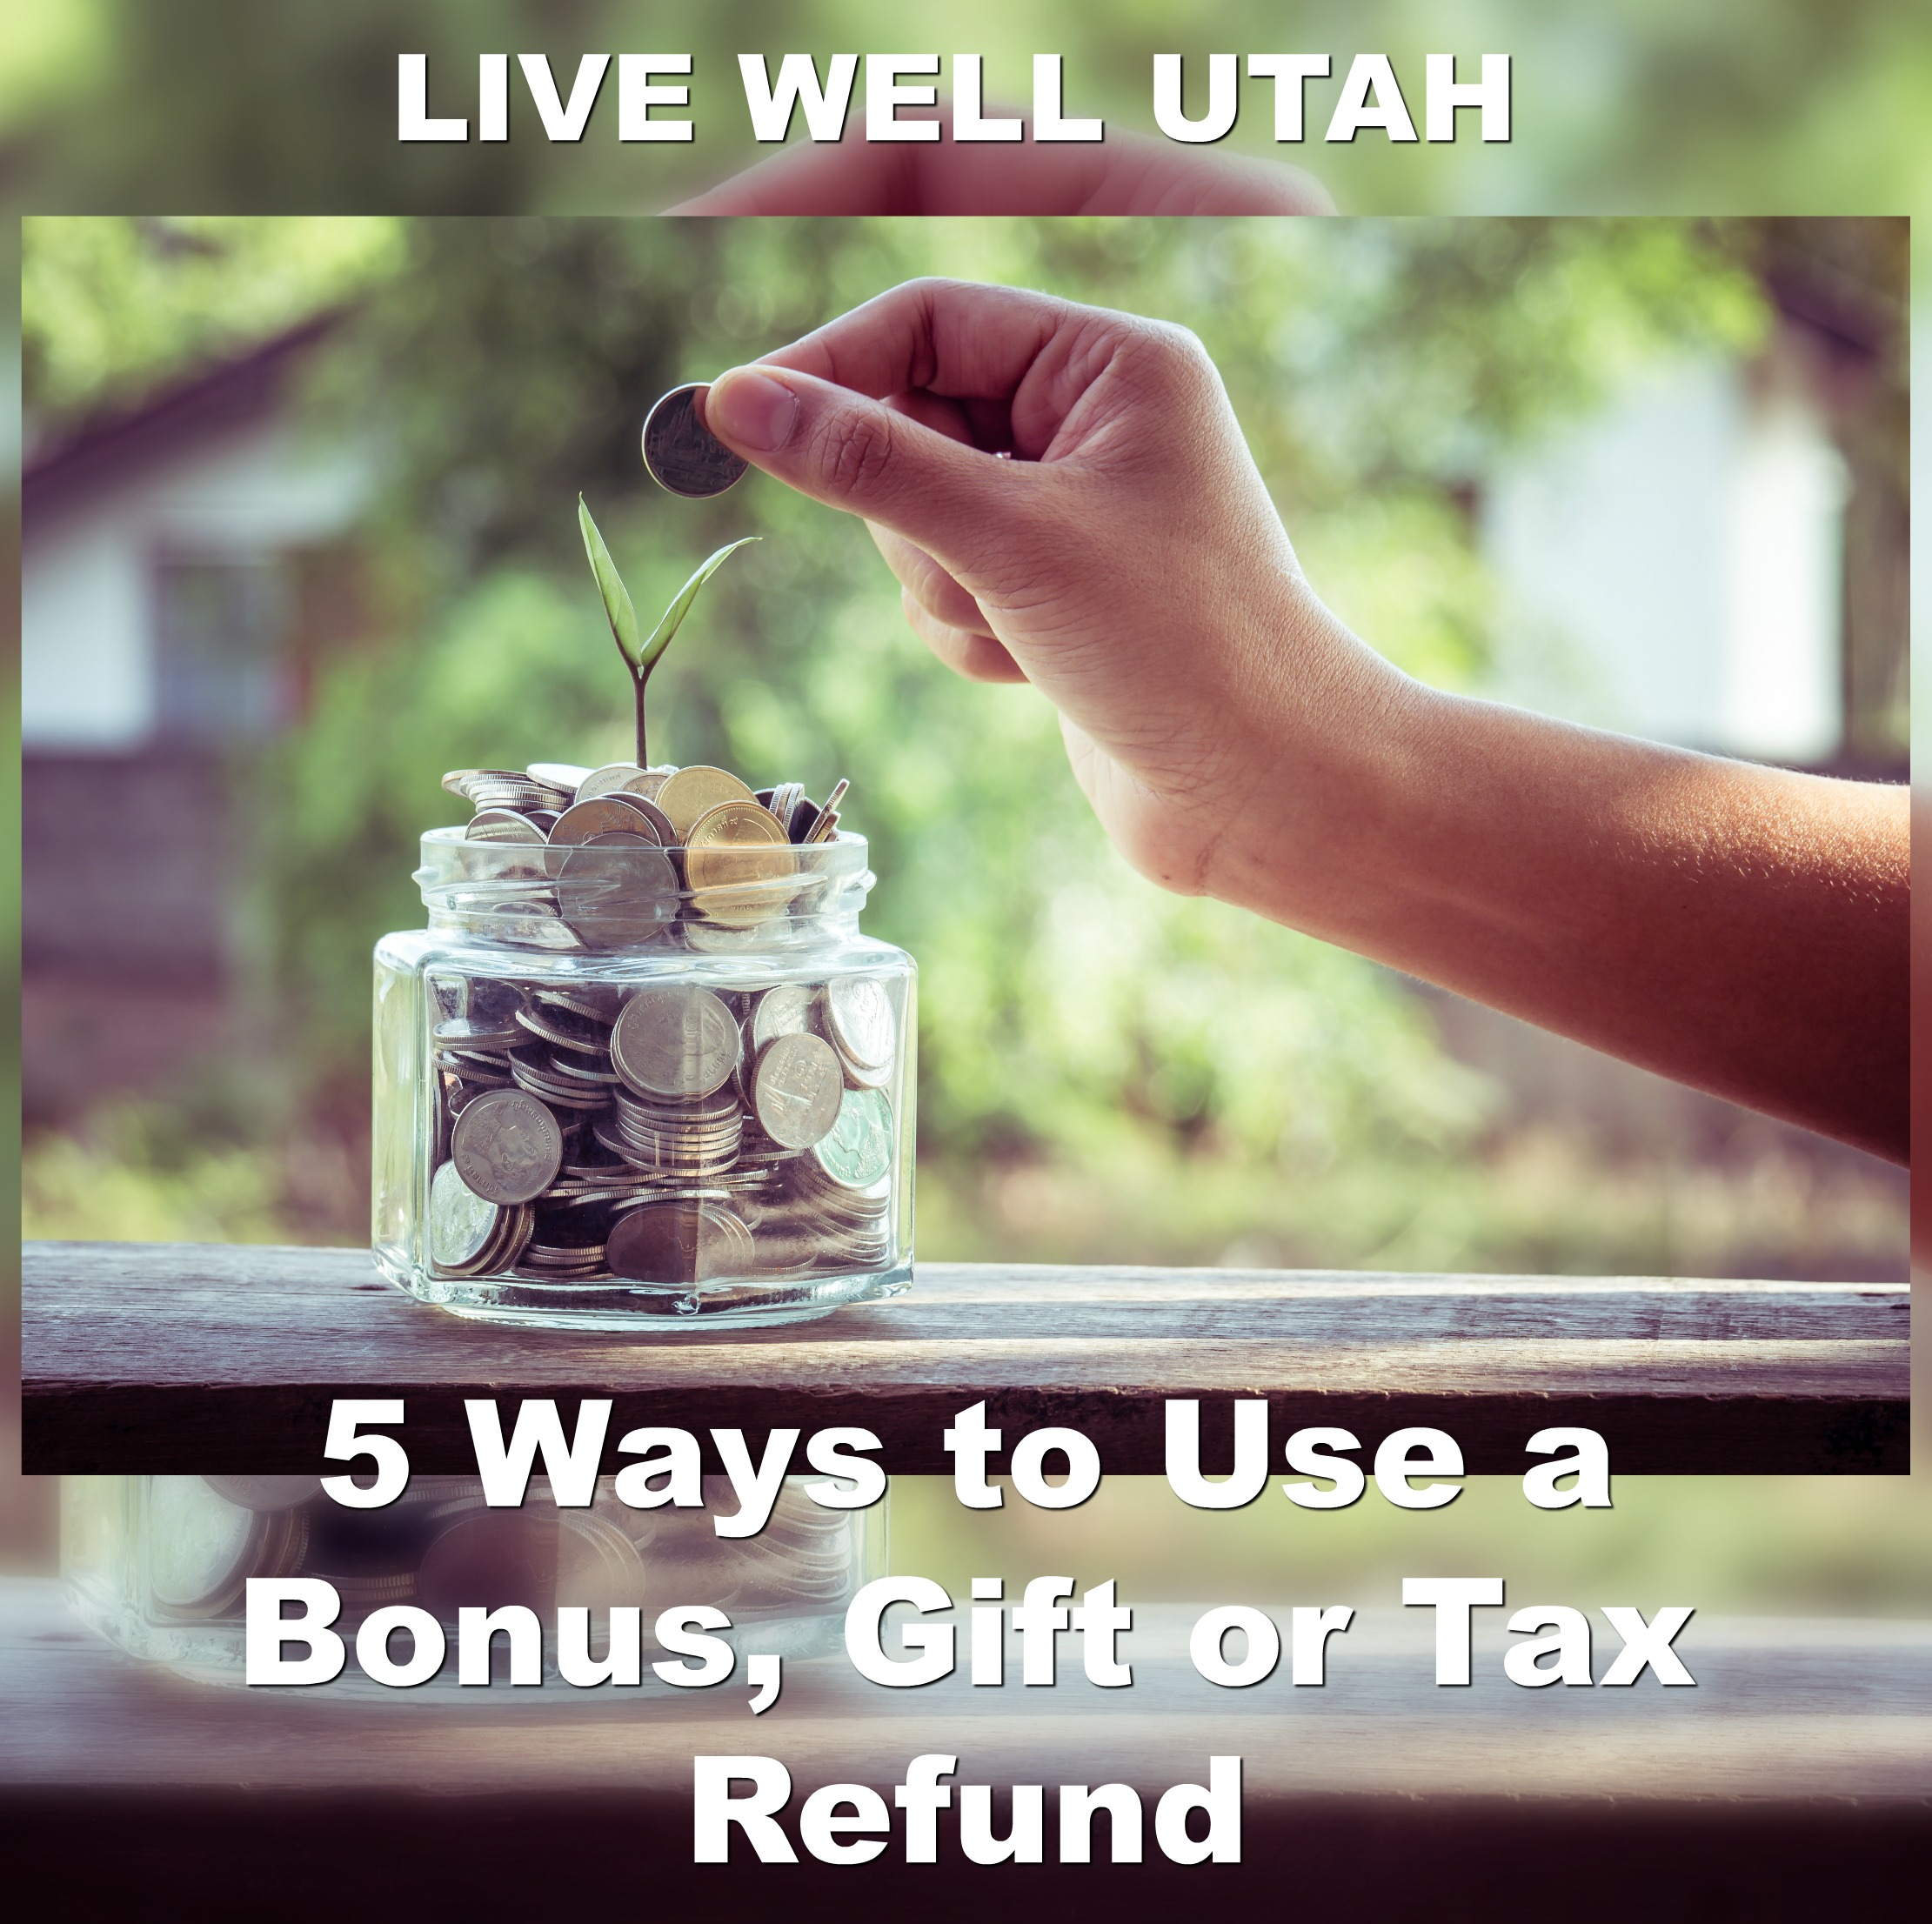 5 ways to use a bonus, gift or tax refund